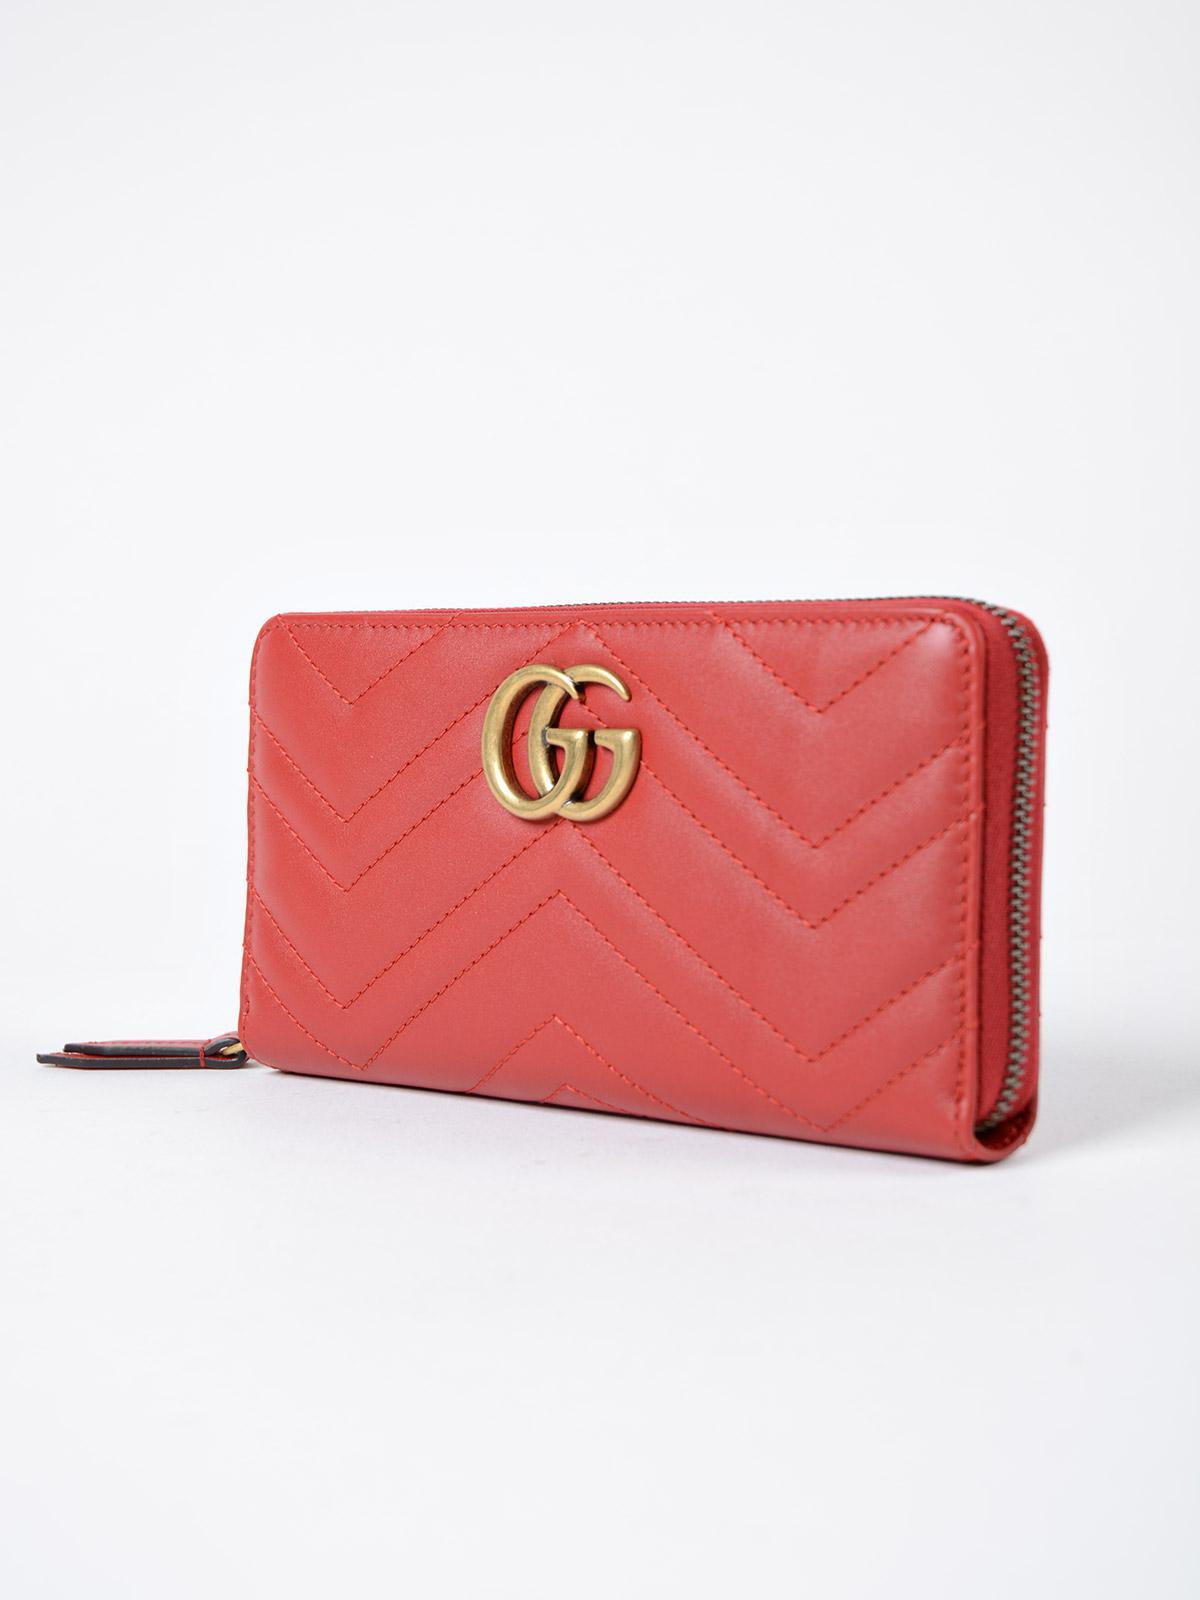 b8af3818d56006 Gucci GG Marmont 2.0 Zip Around Wallet in Red - Save 4% - Lyst